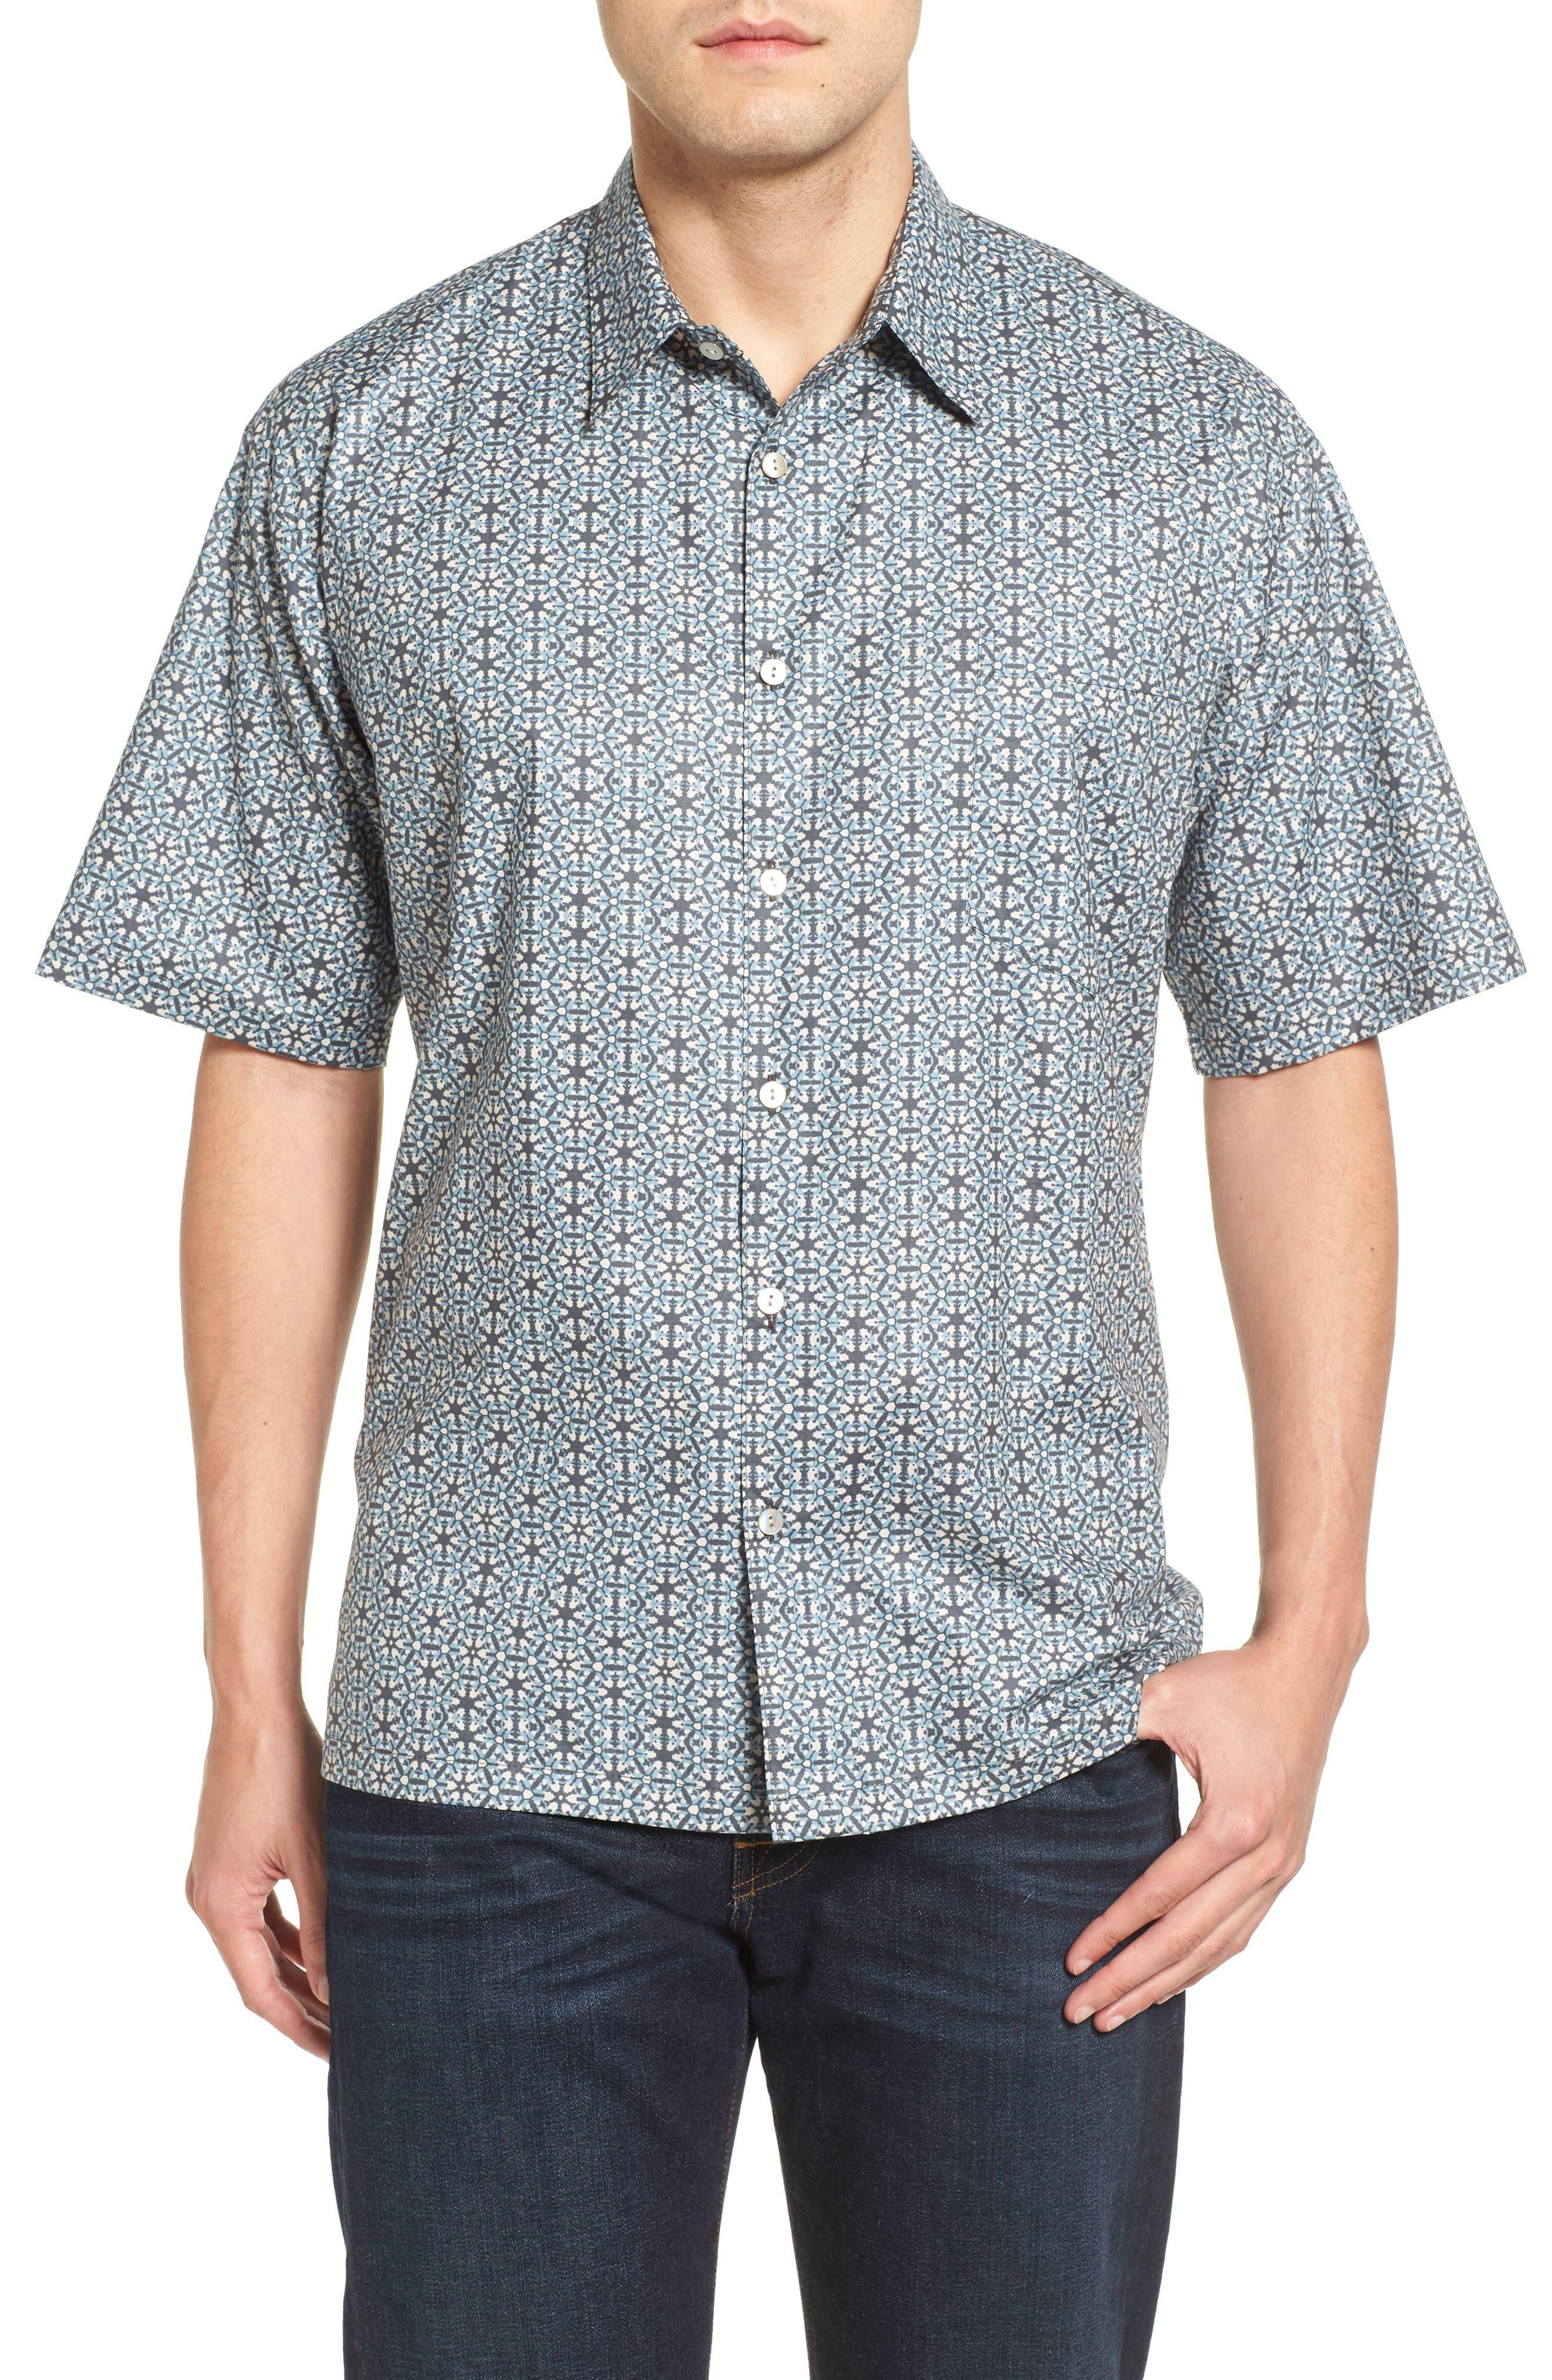 Tori Richard Concinnity Short Sleeve Classic Fit Sport Shirt